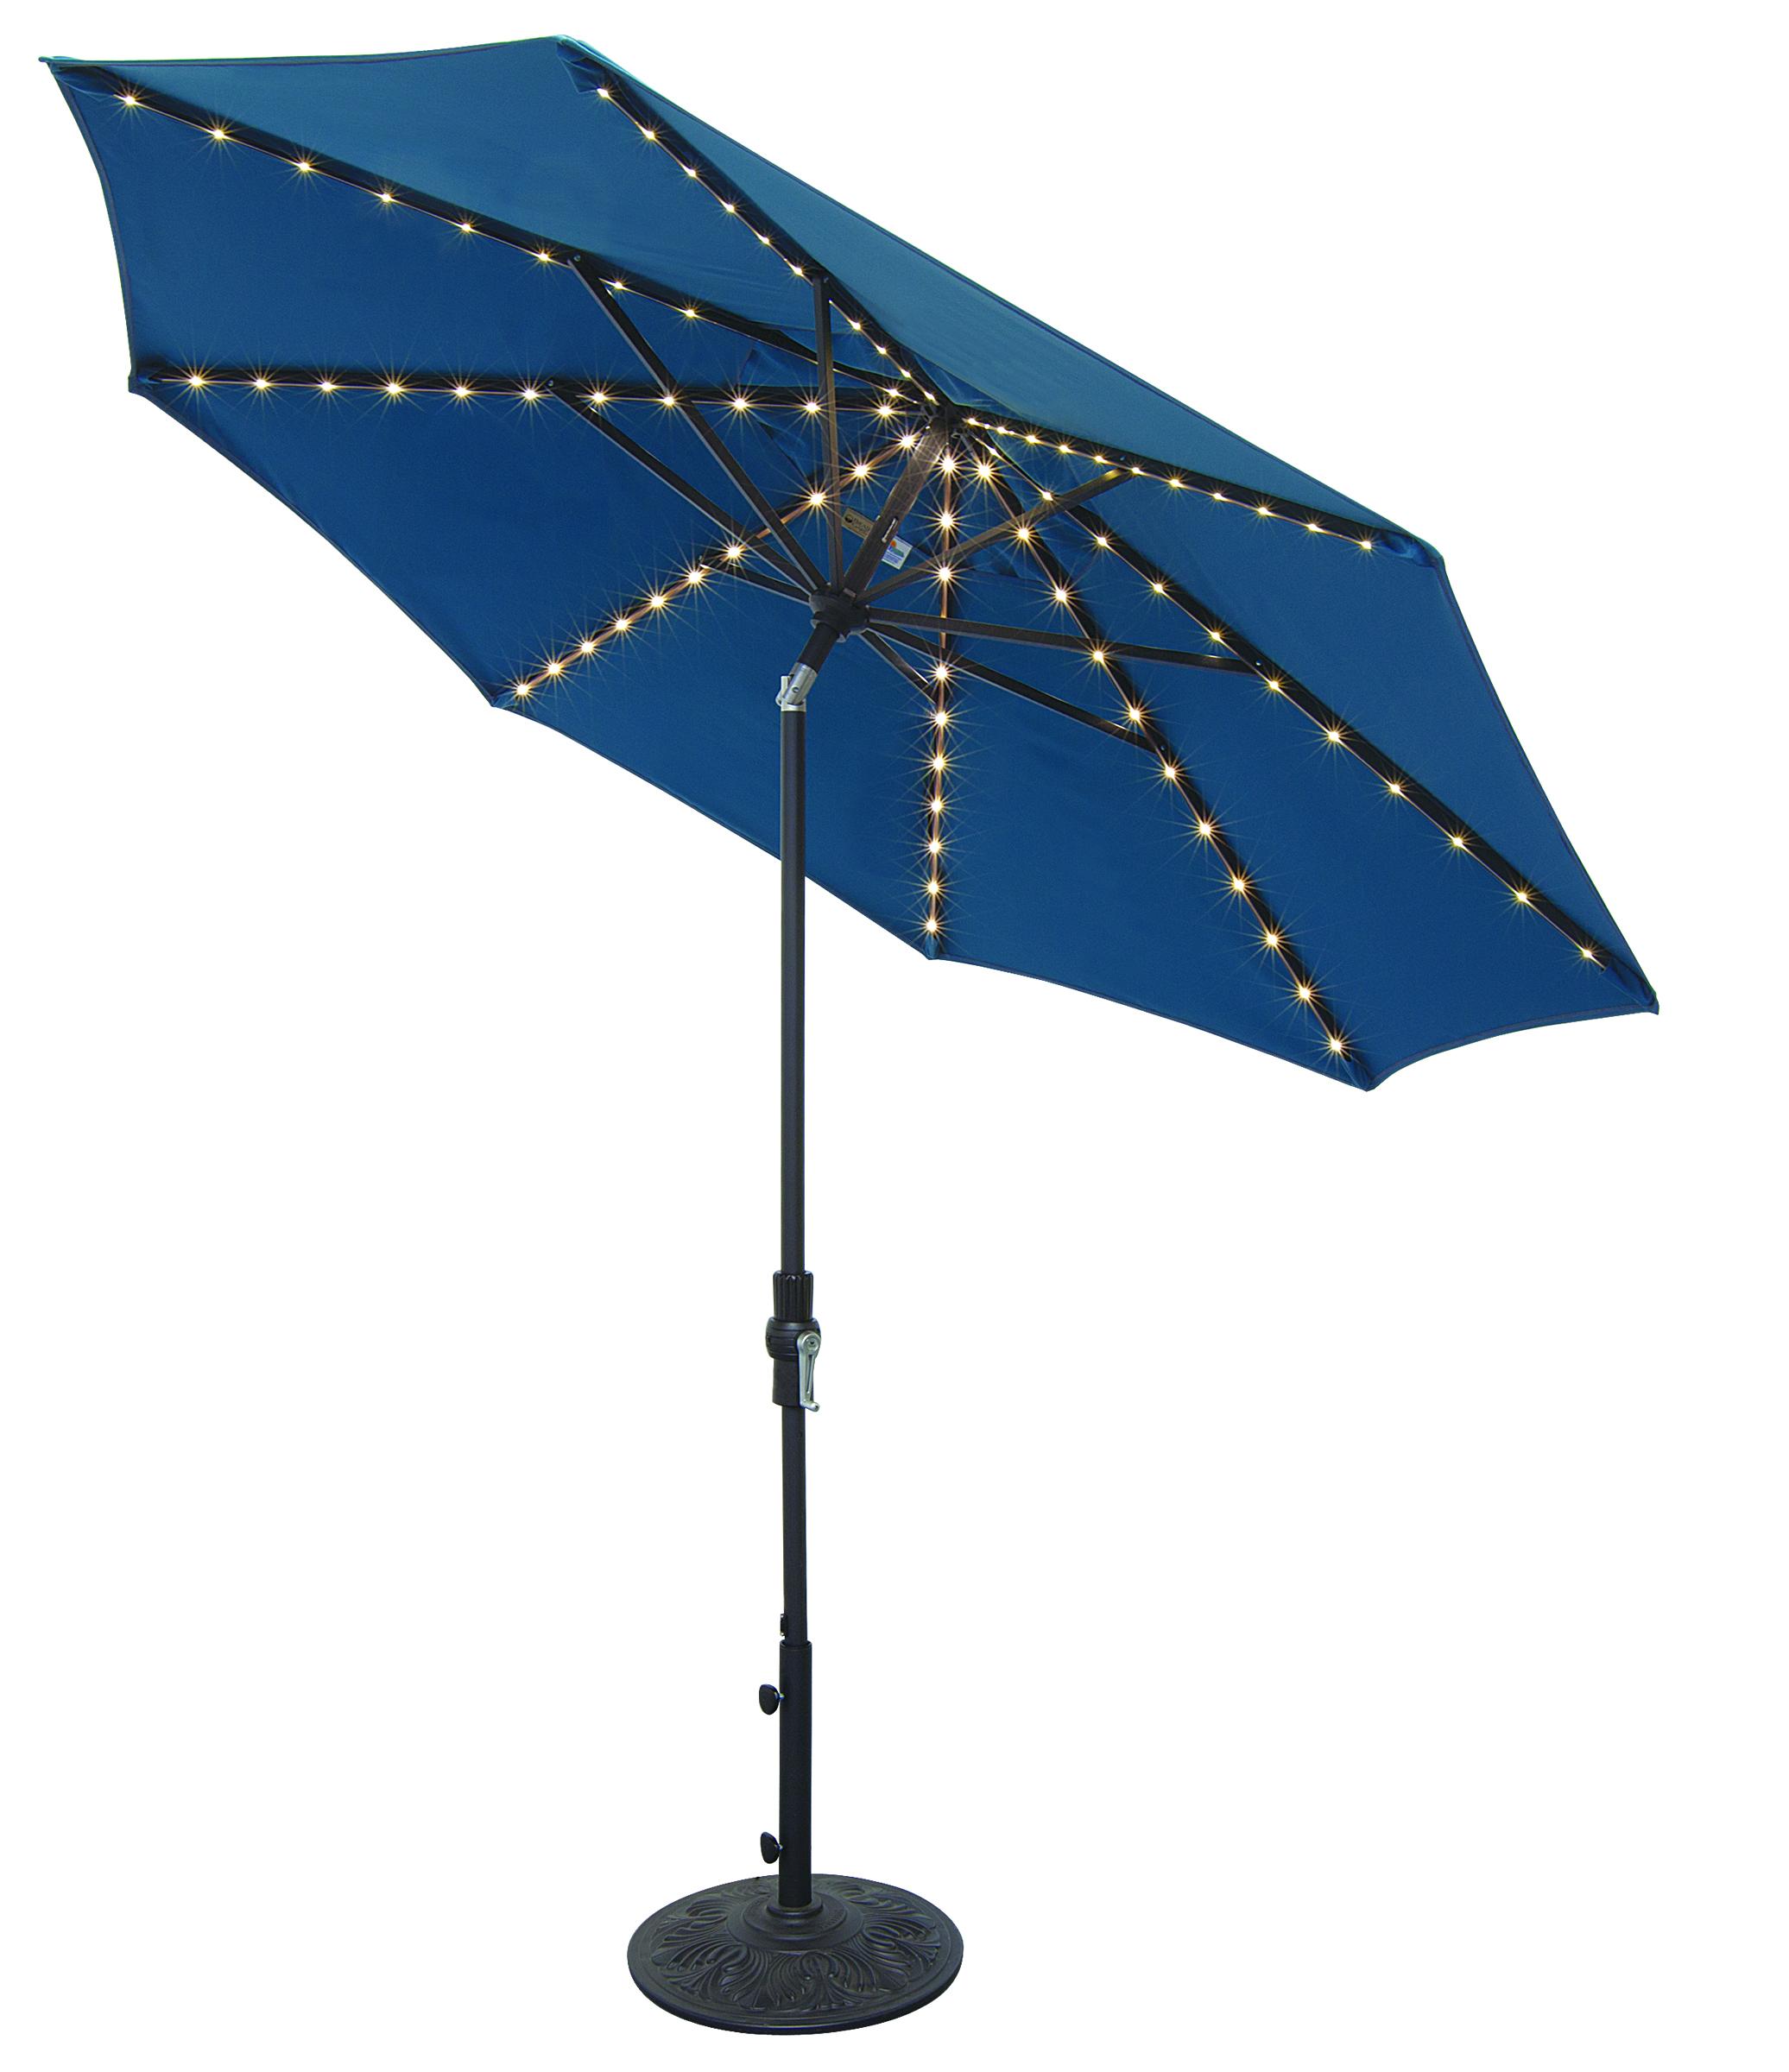 Patio umbrella store galtech umbrellas treasure garden for Outdoor patio umbrellas